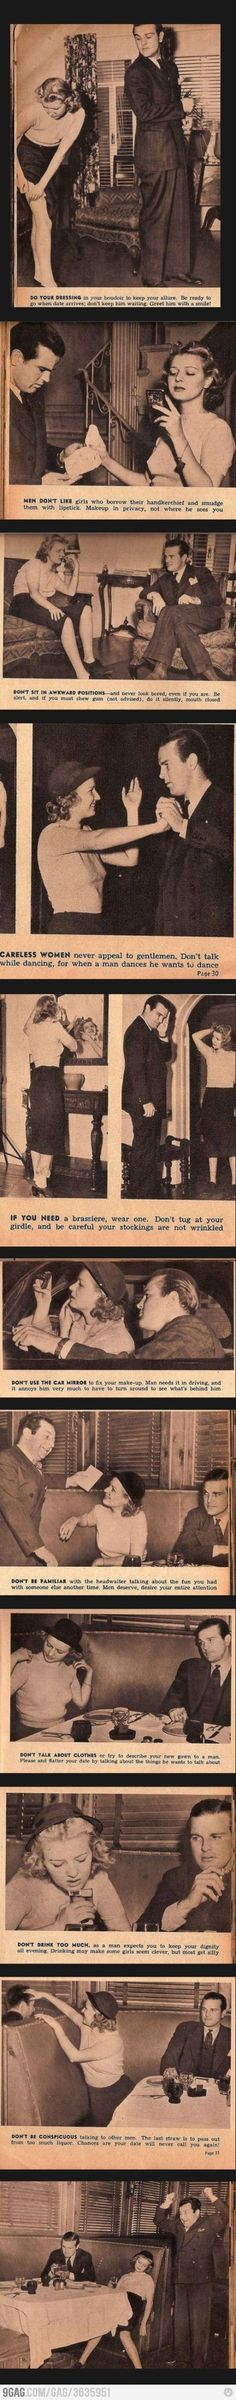 Vintage tips for women!